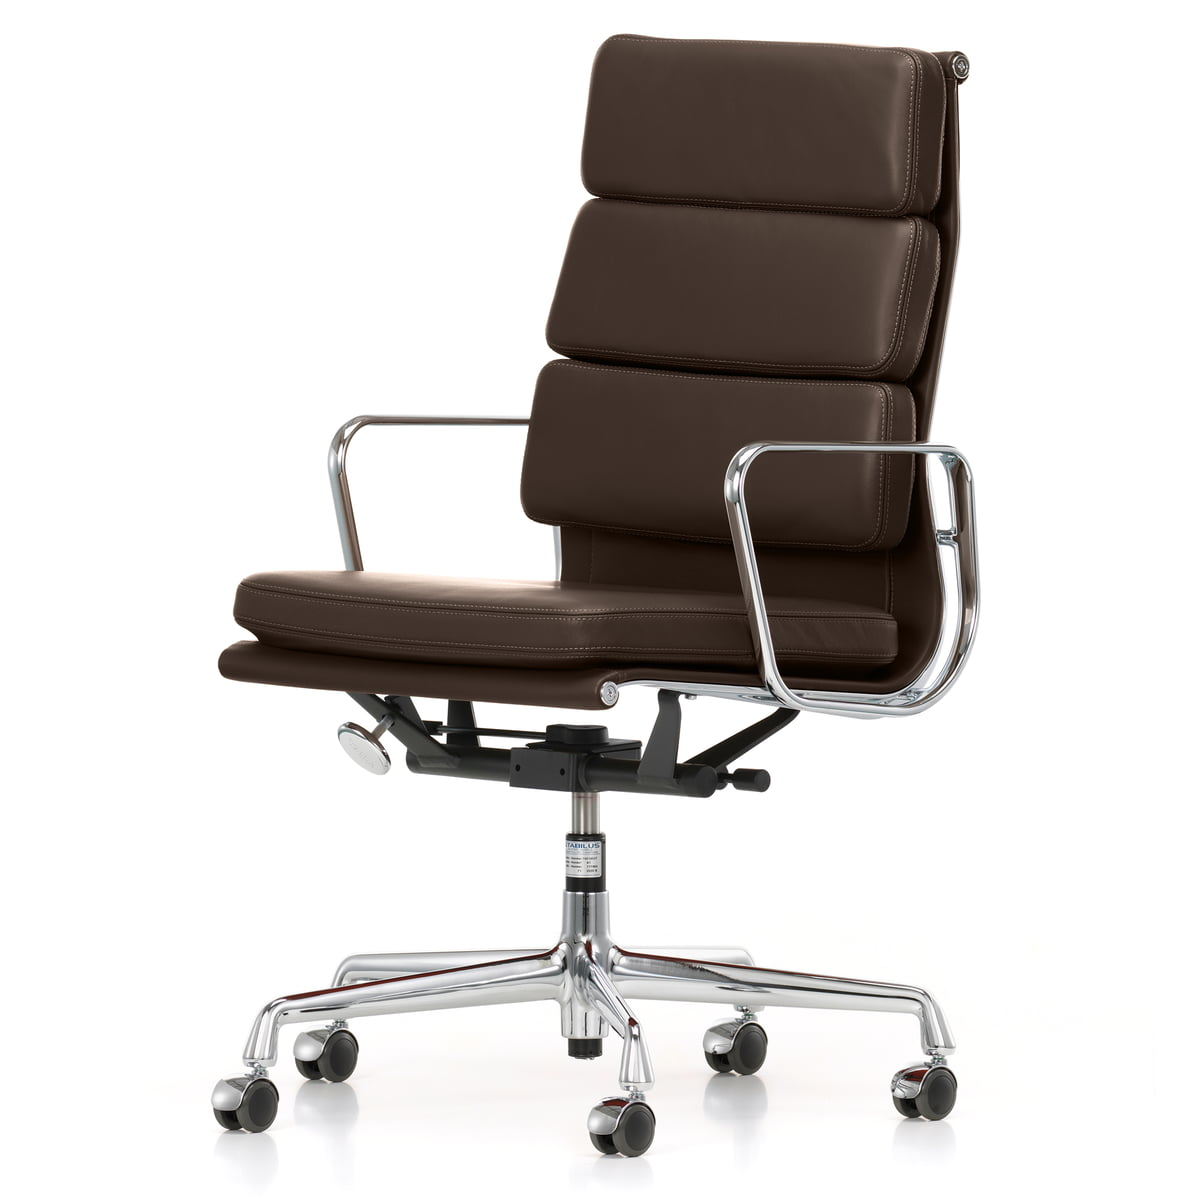 soft pad chair ea 219 b rostuhl von vitra connox. Black Bedroom Furniture Sets. Home Design Ideas